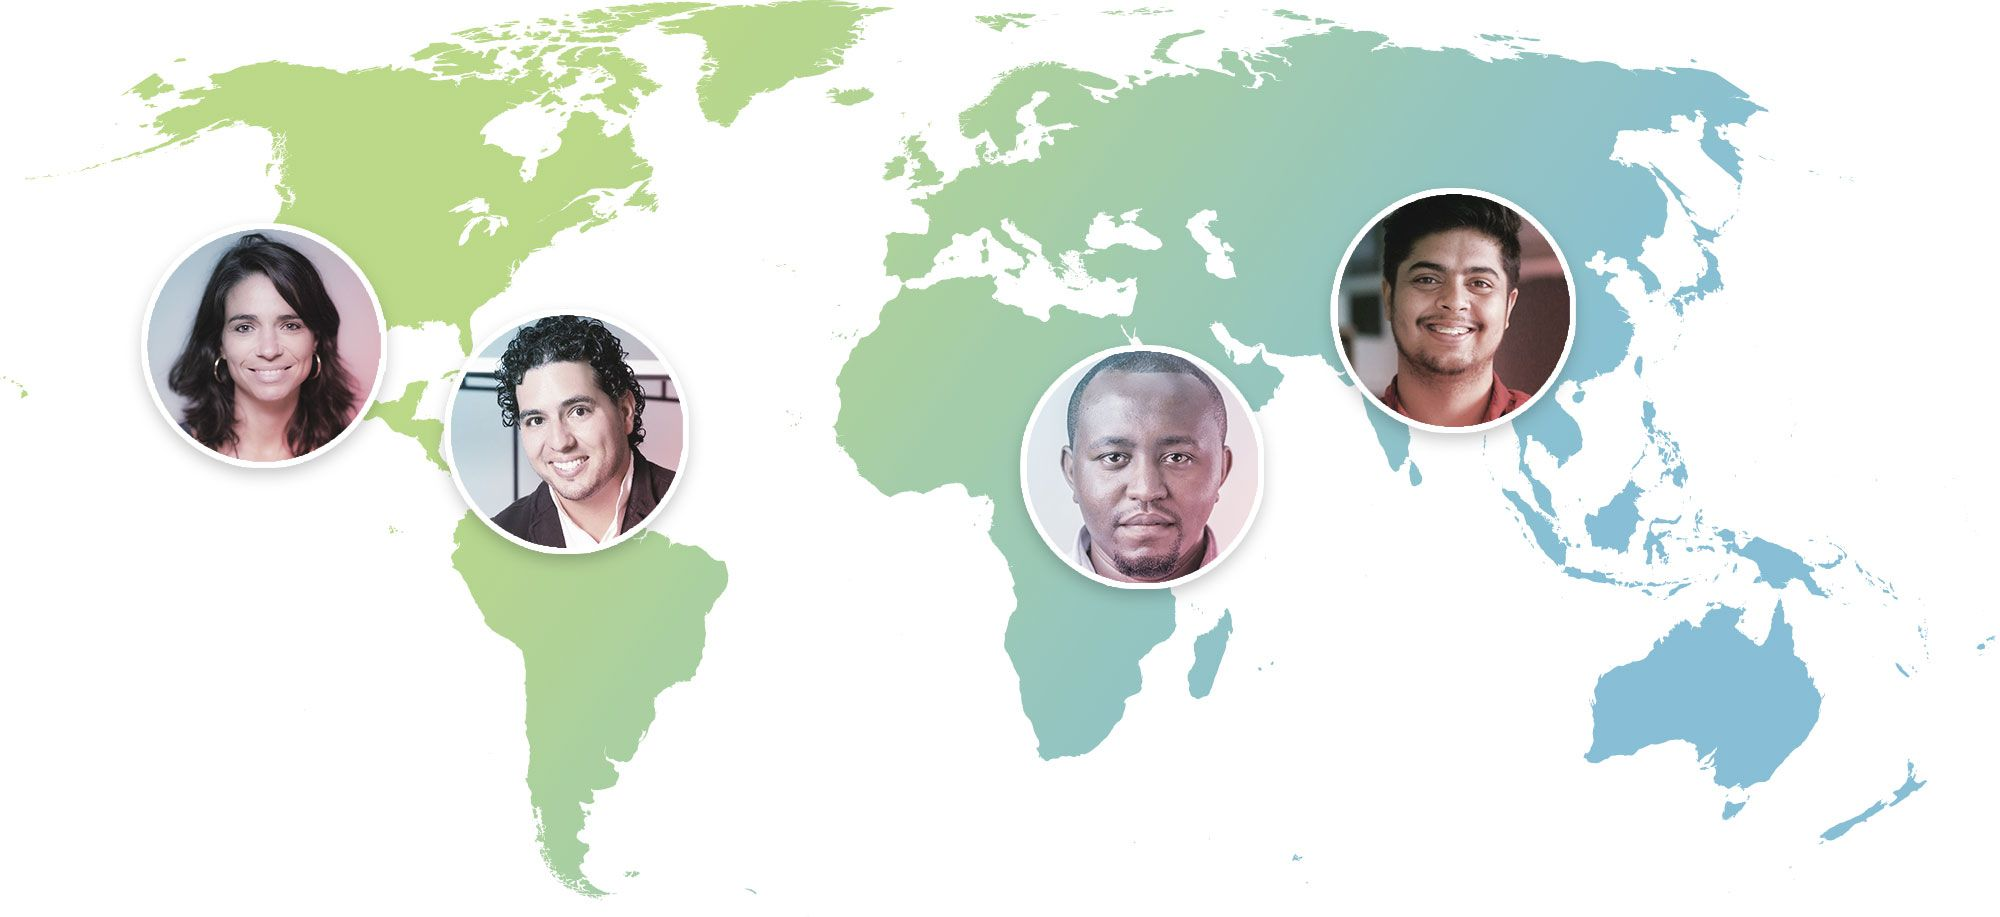 Ethereum for the Next Billion: Announcing the EF Fellowship Program